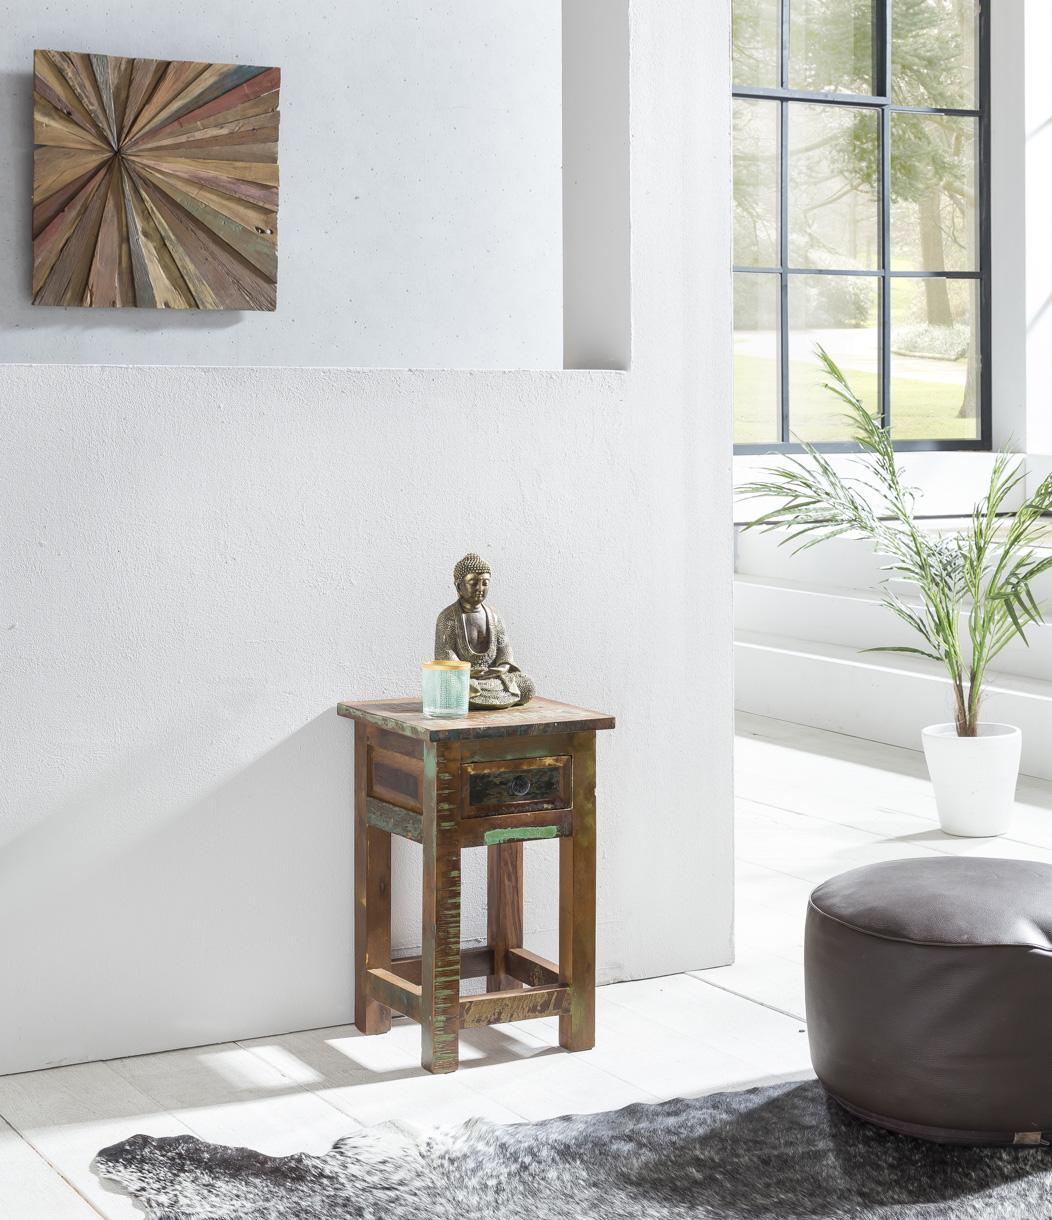 Odkládací stolek z recyklovaného dřeva Kalkutta, 30x50 cm, mango